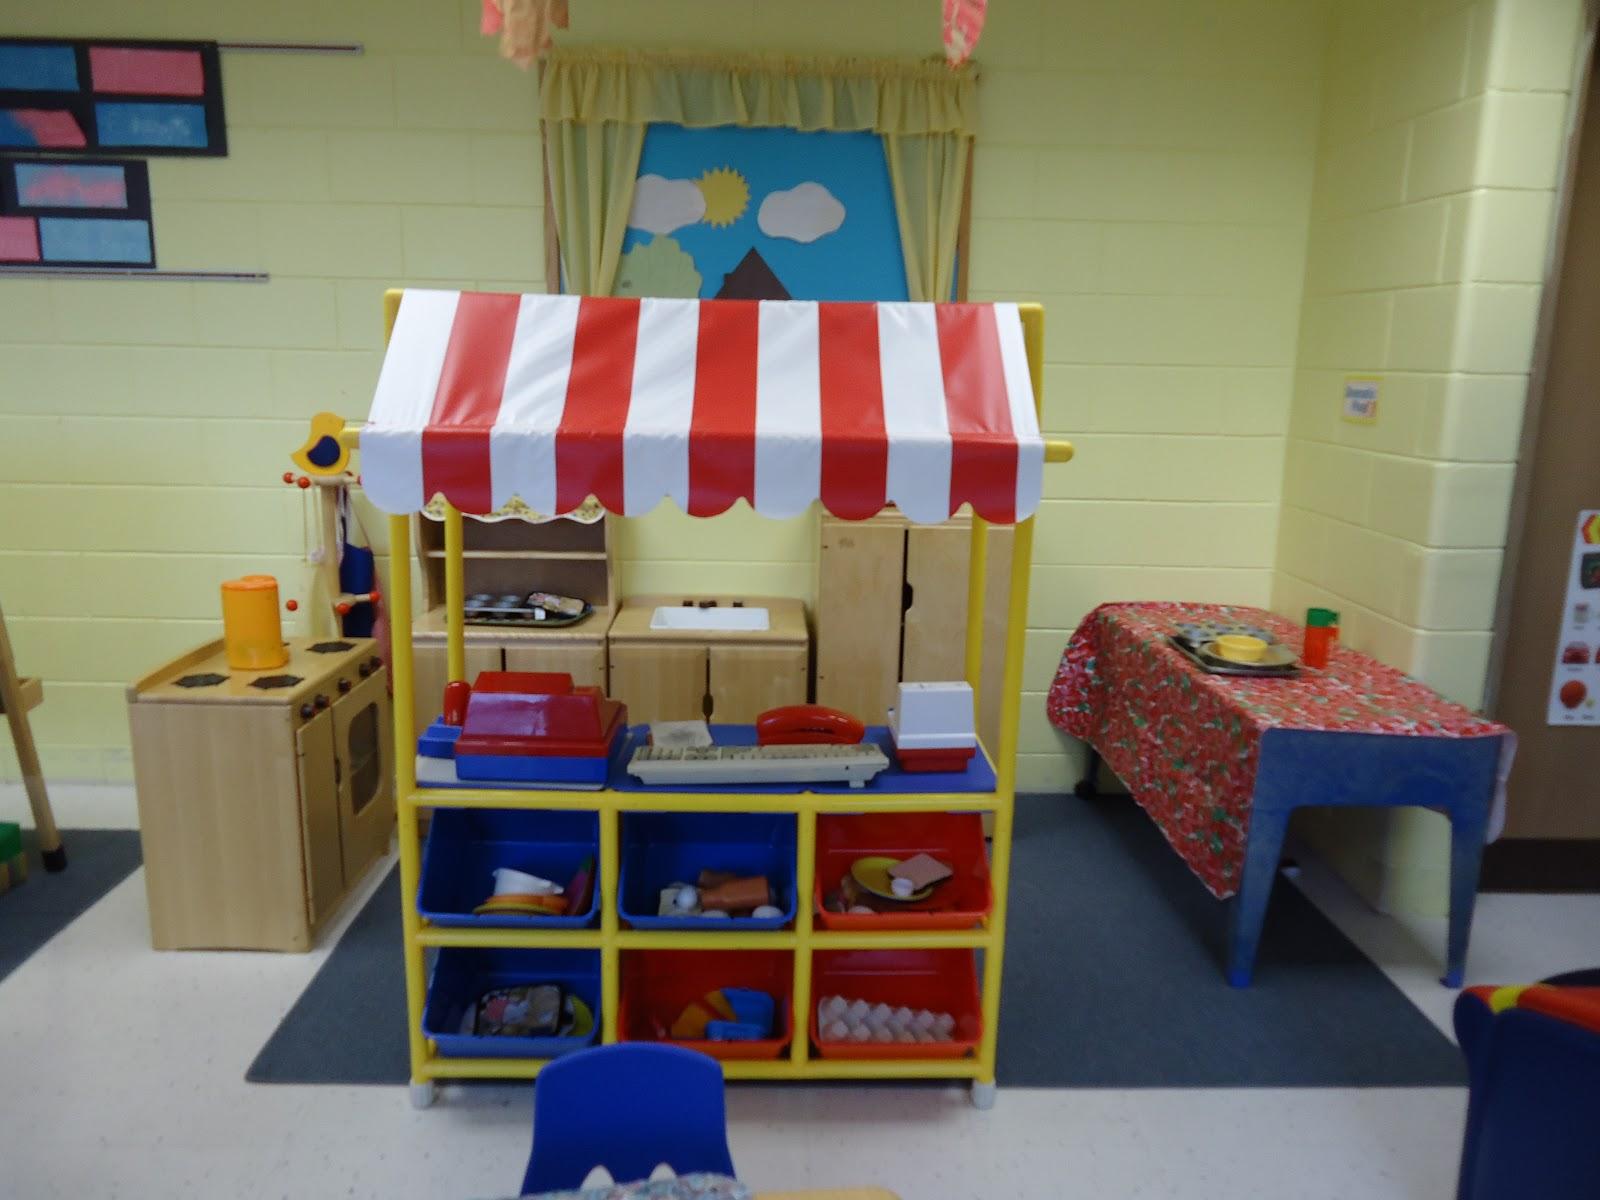 Classroom Store Ideas : Trinity preschool mount prospect dramatic play bakery fun